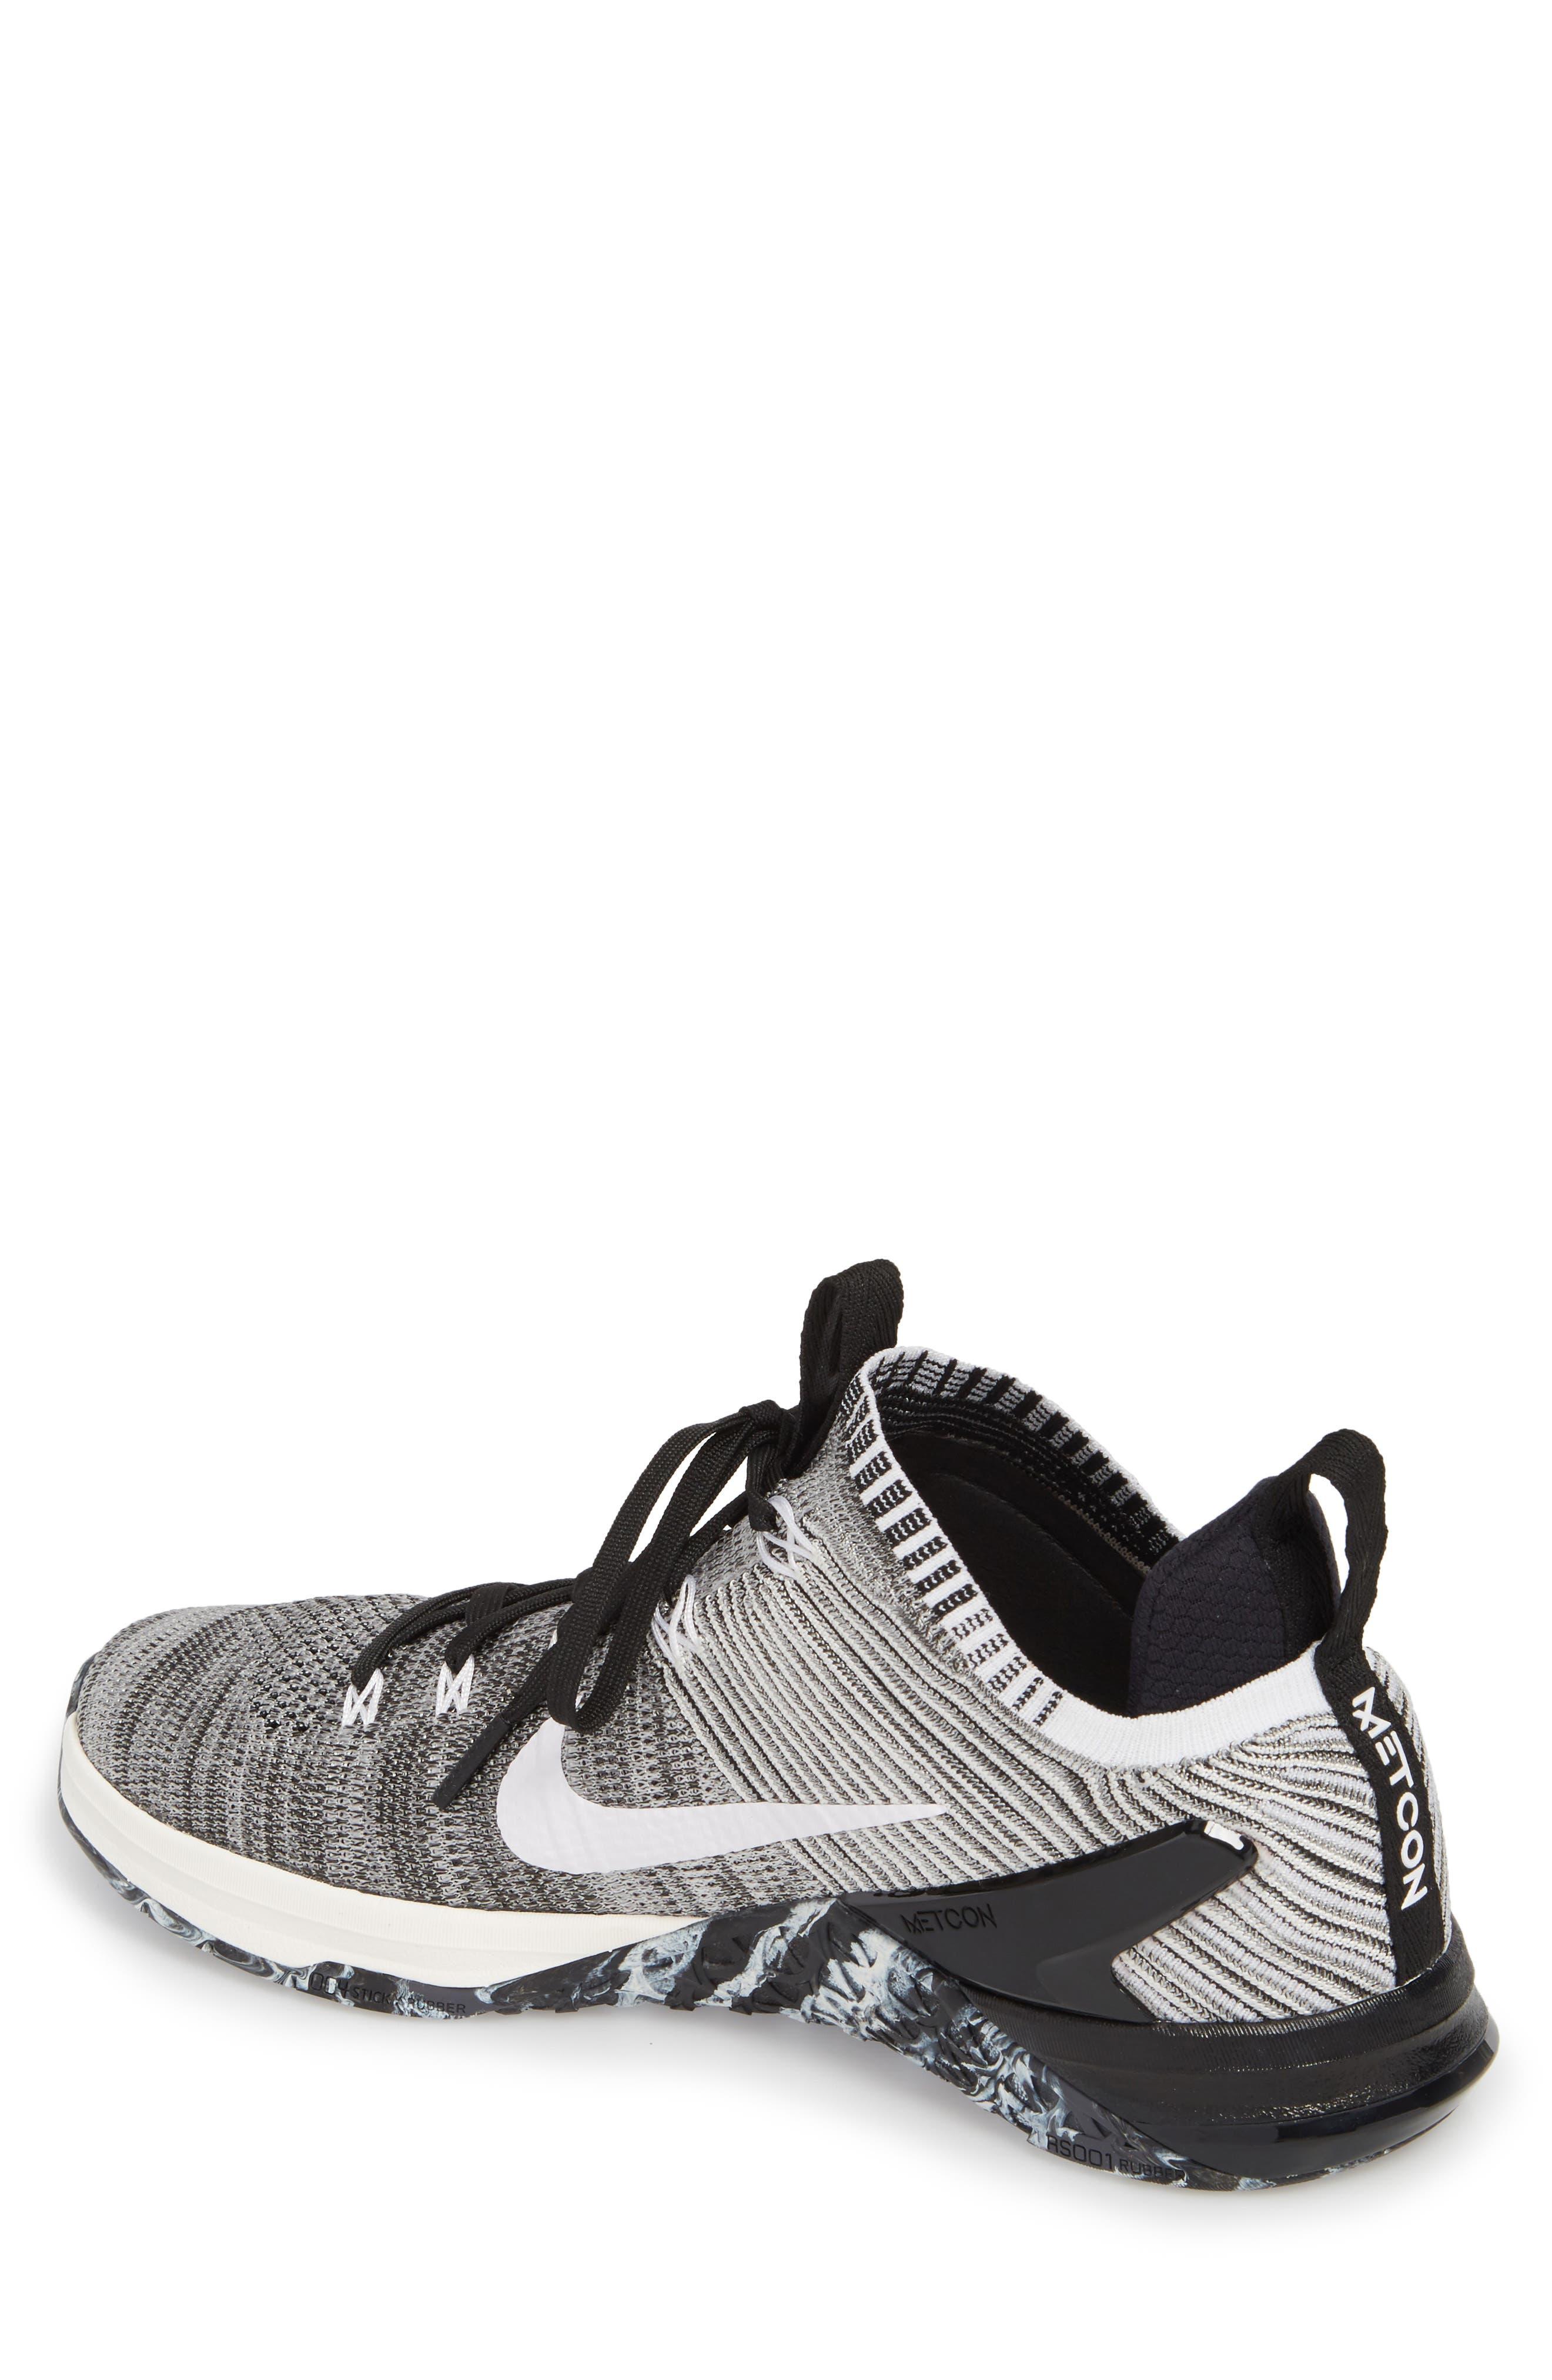 Alternate Image 2  - Nike Metcon DSX Flyknit 2 Training Shoe (Men)